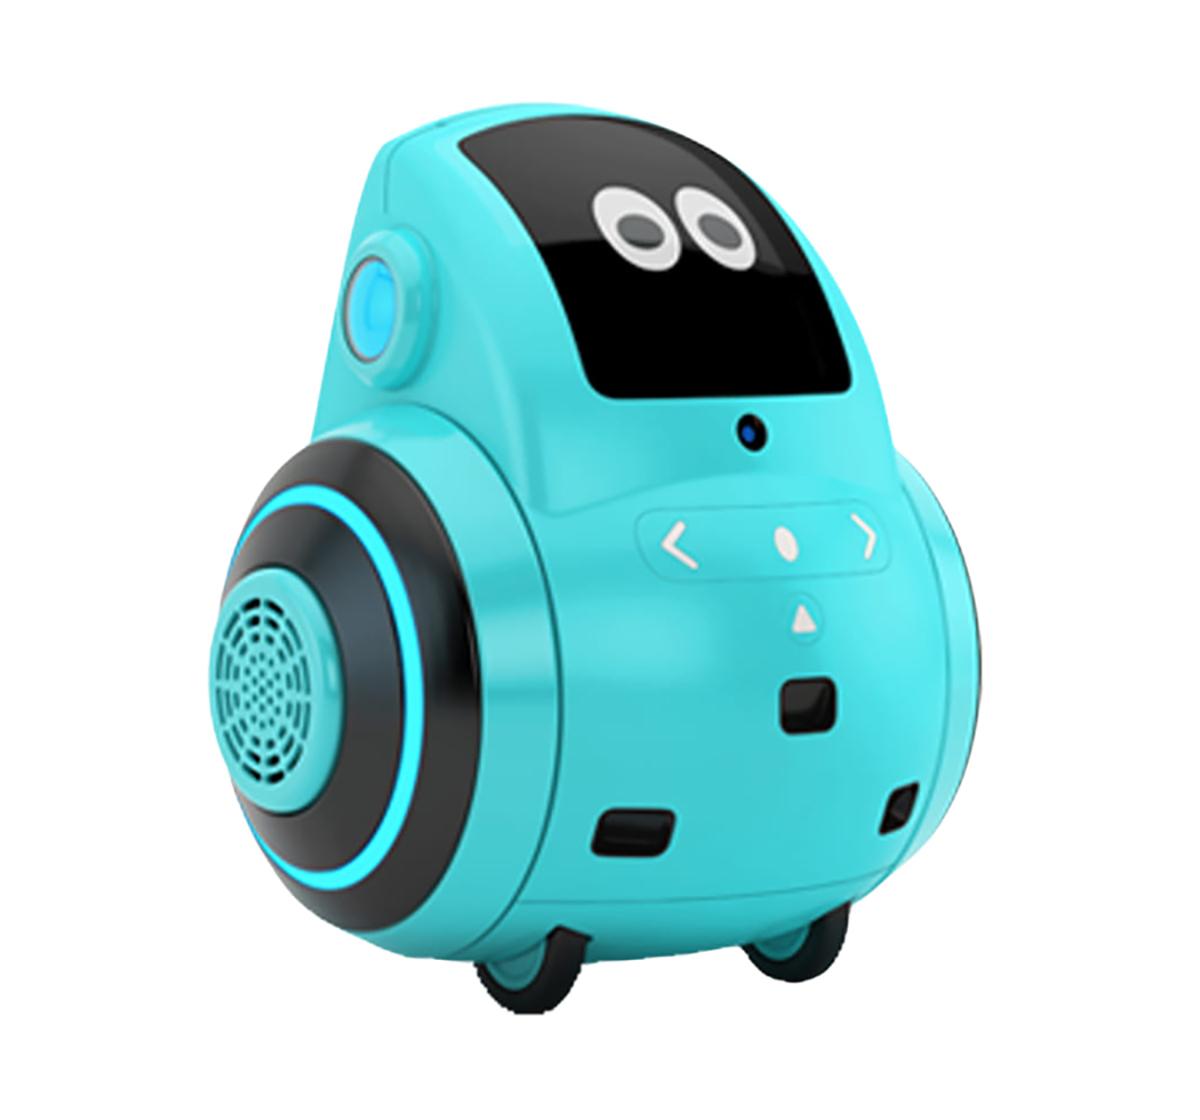 Miko   Miko 2 My Companion Robot - Blue Robotics for Kids age 5Y+ (Blue)